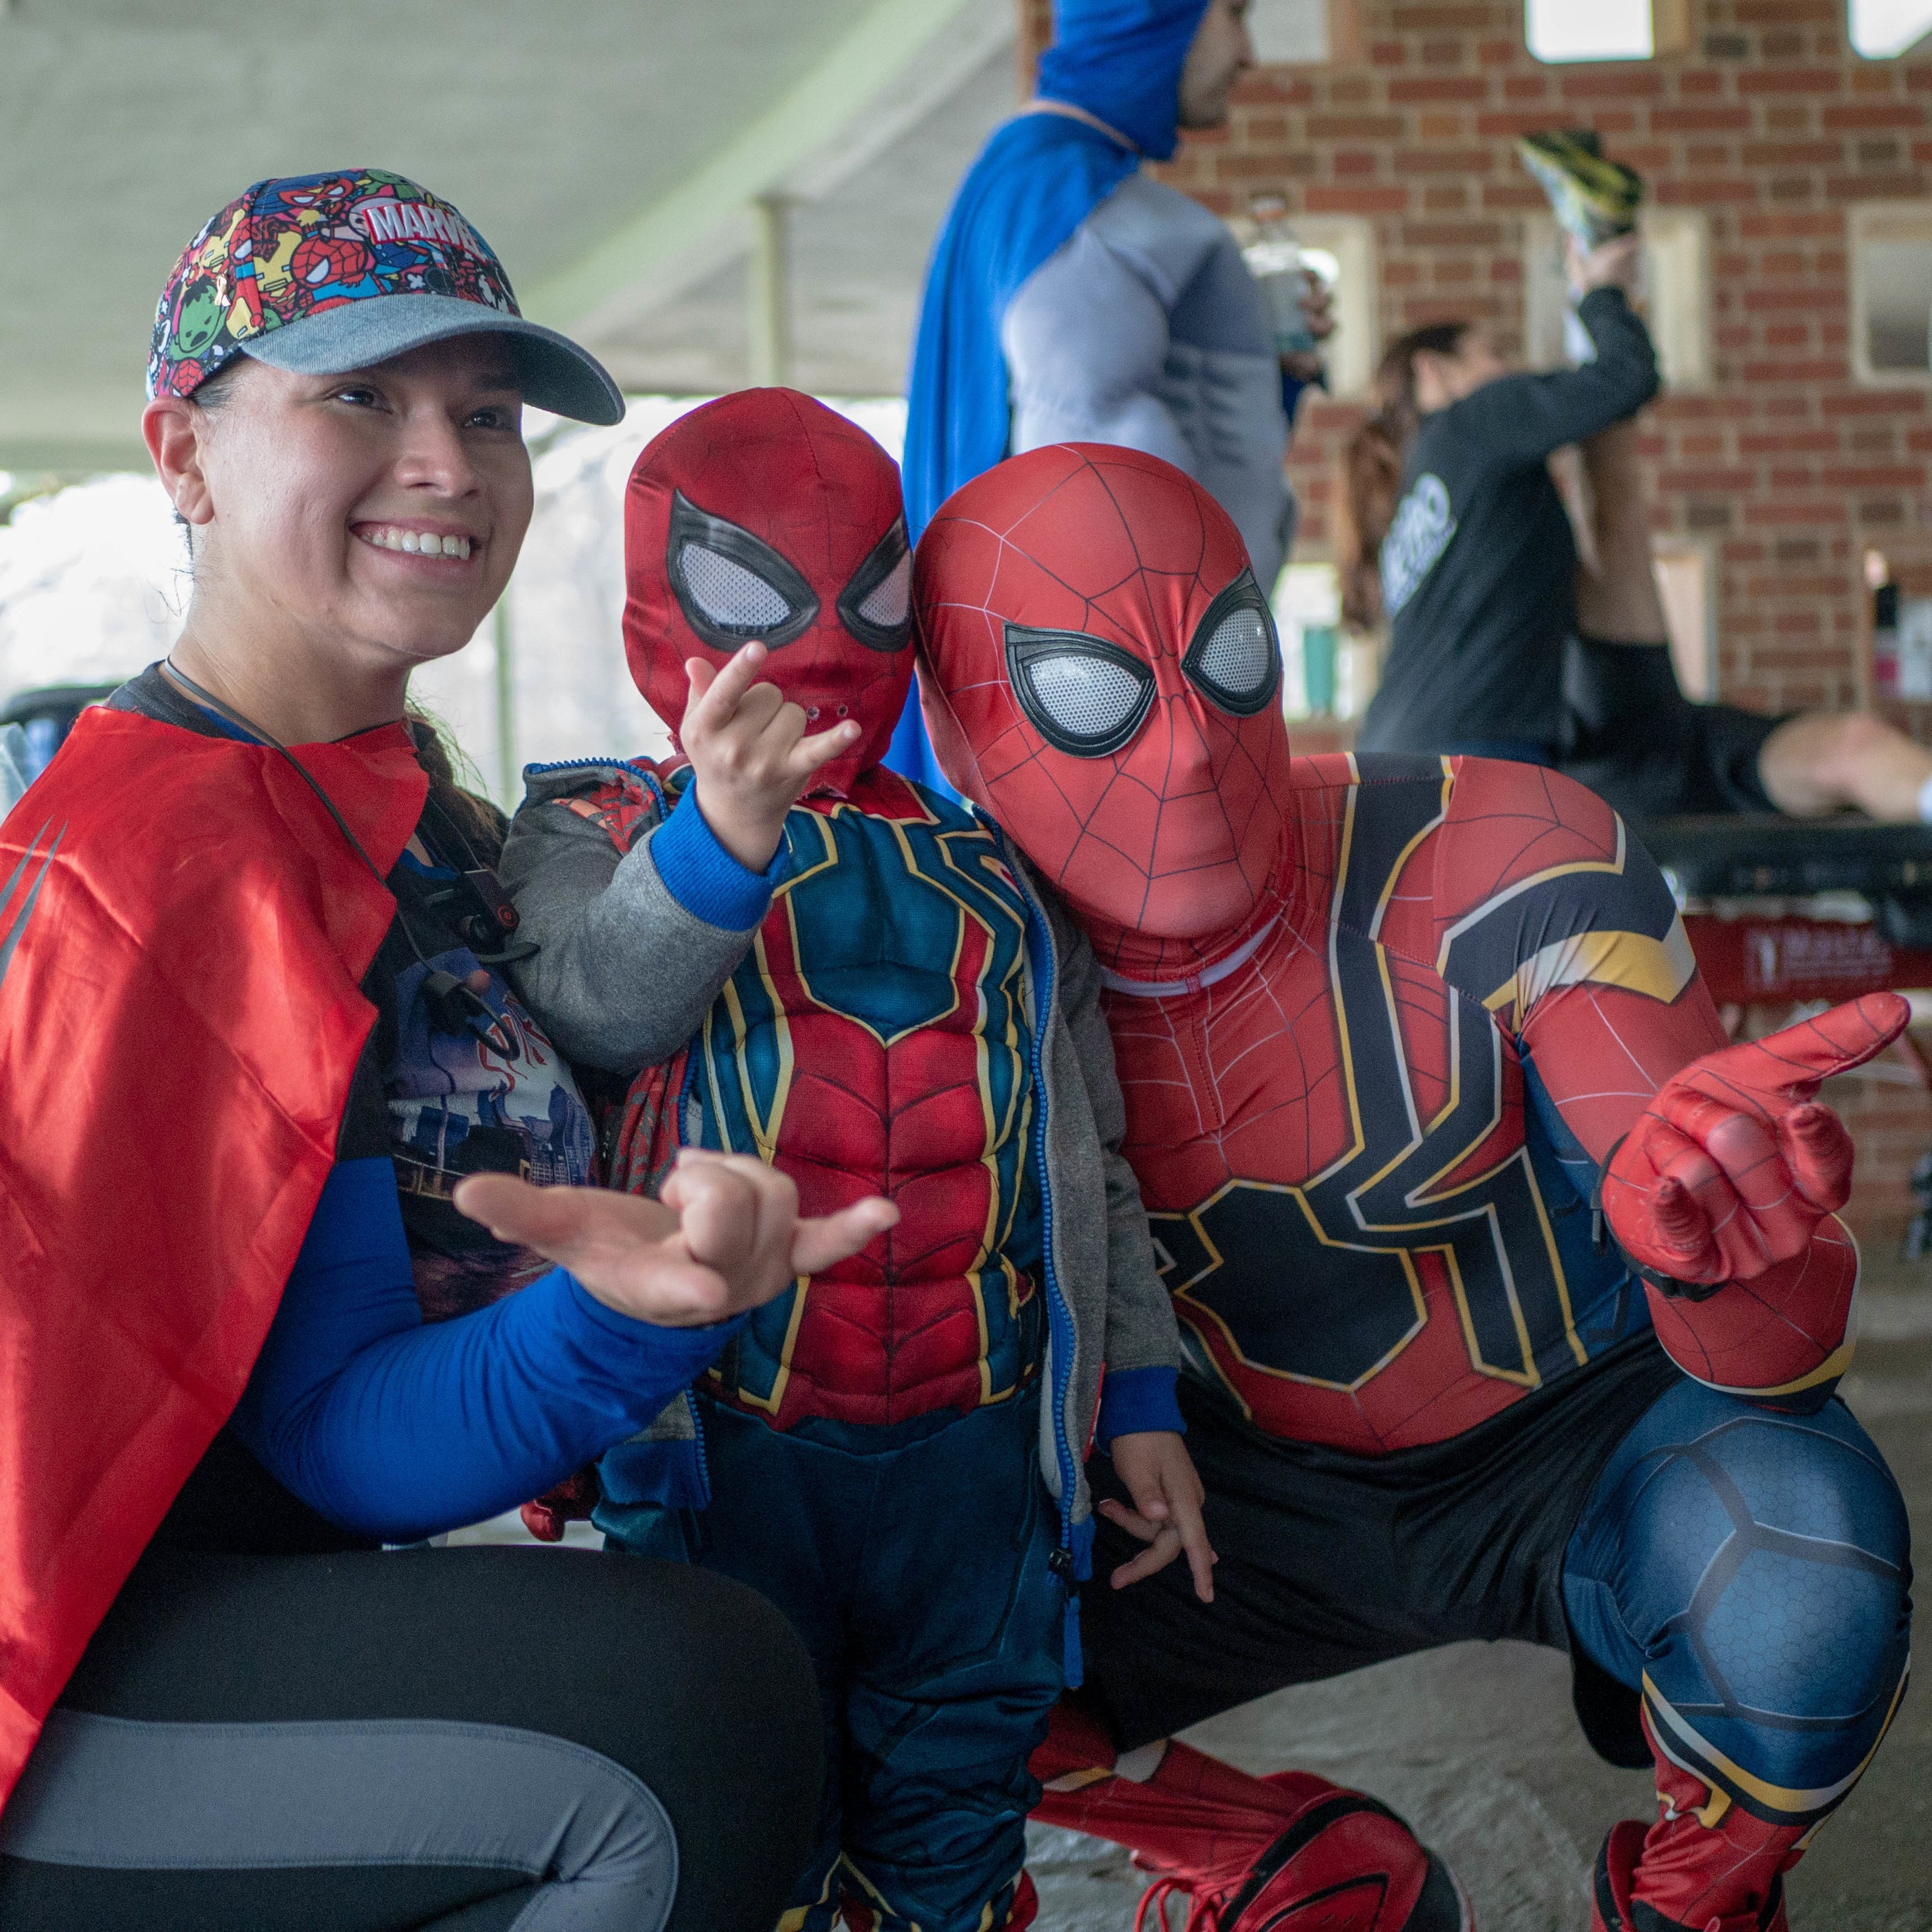 Metro's 2019 Superhero 5k